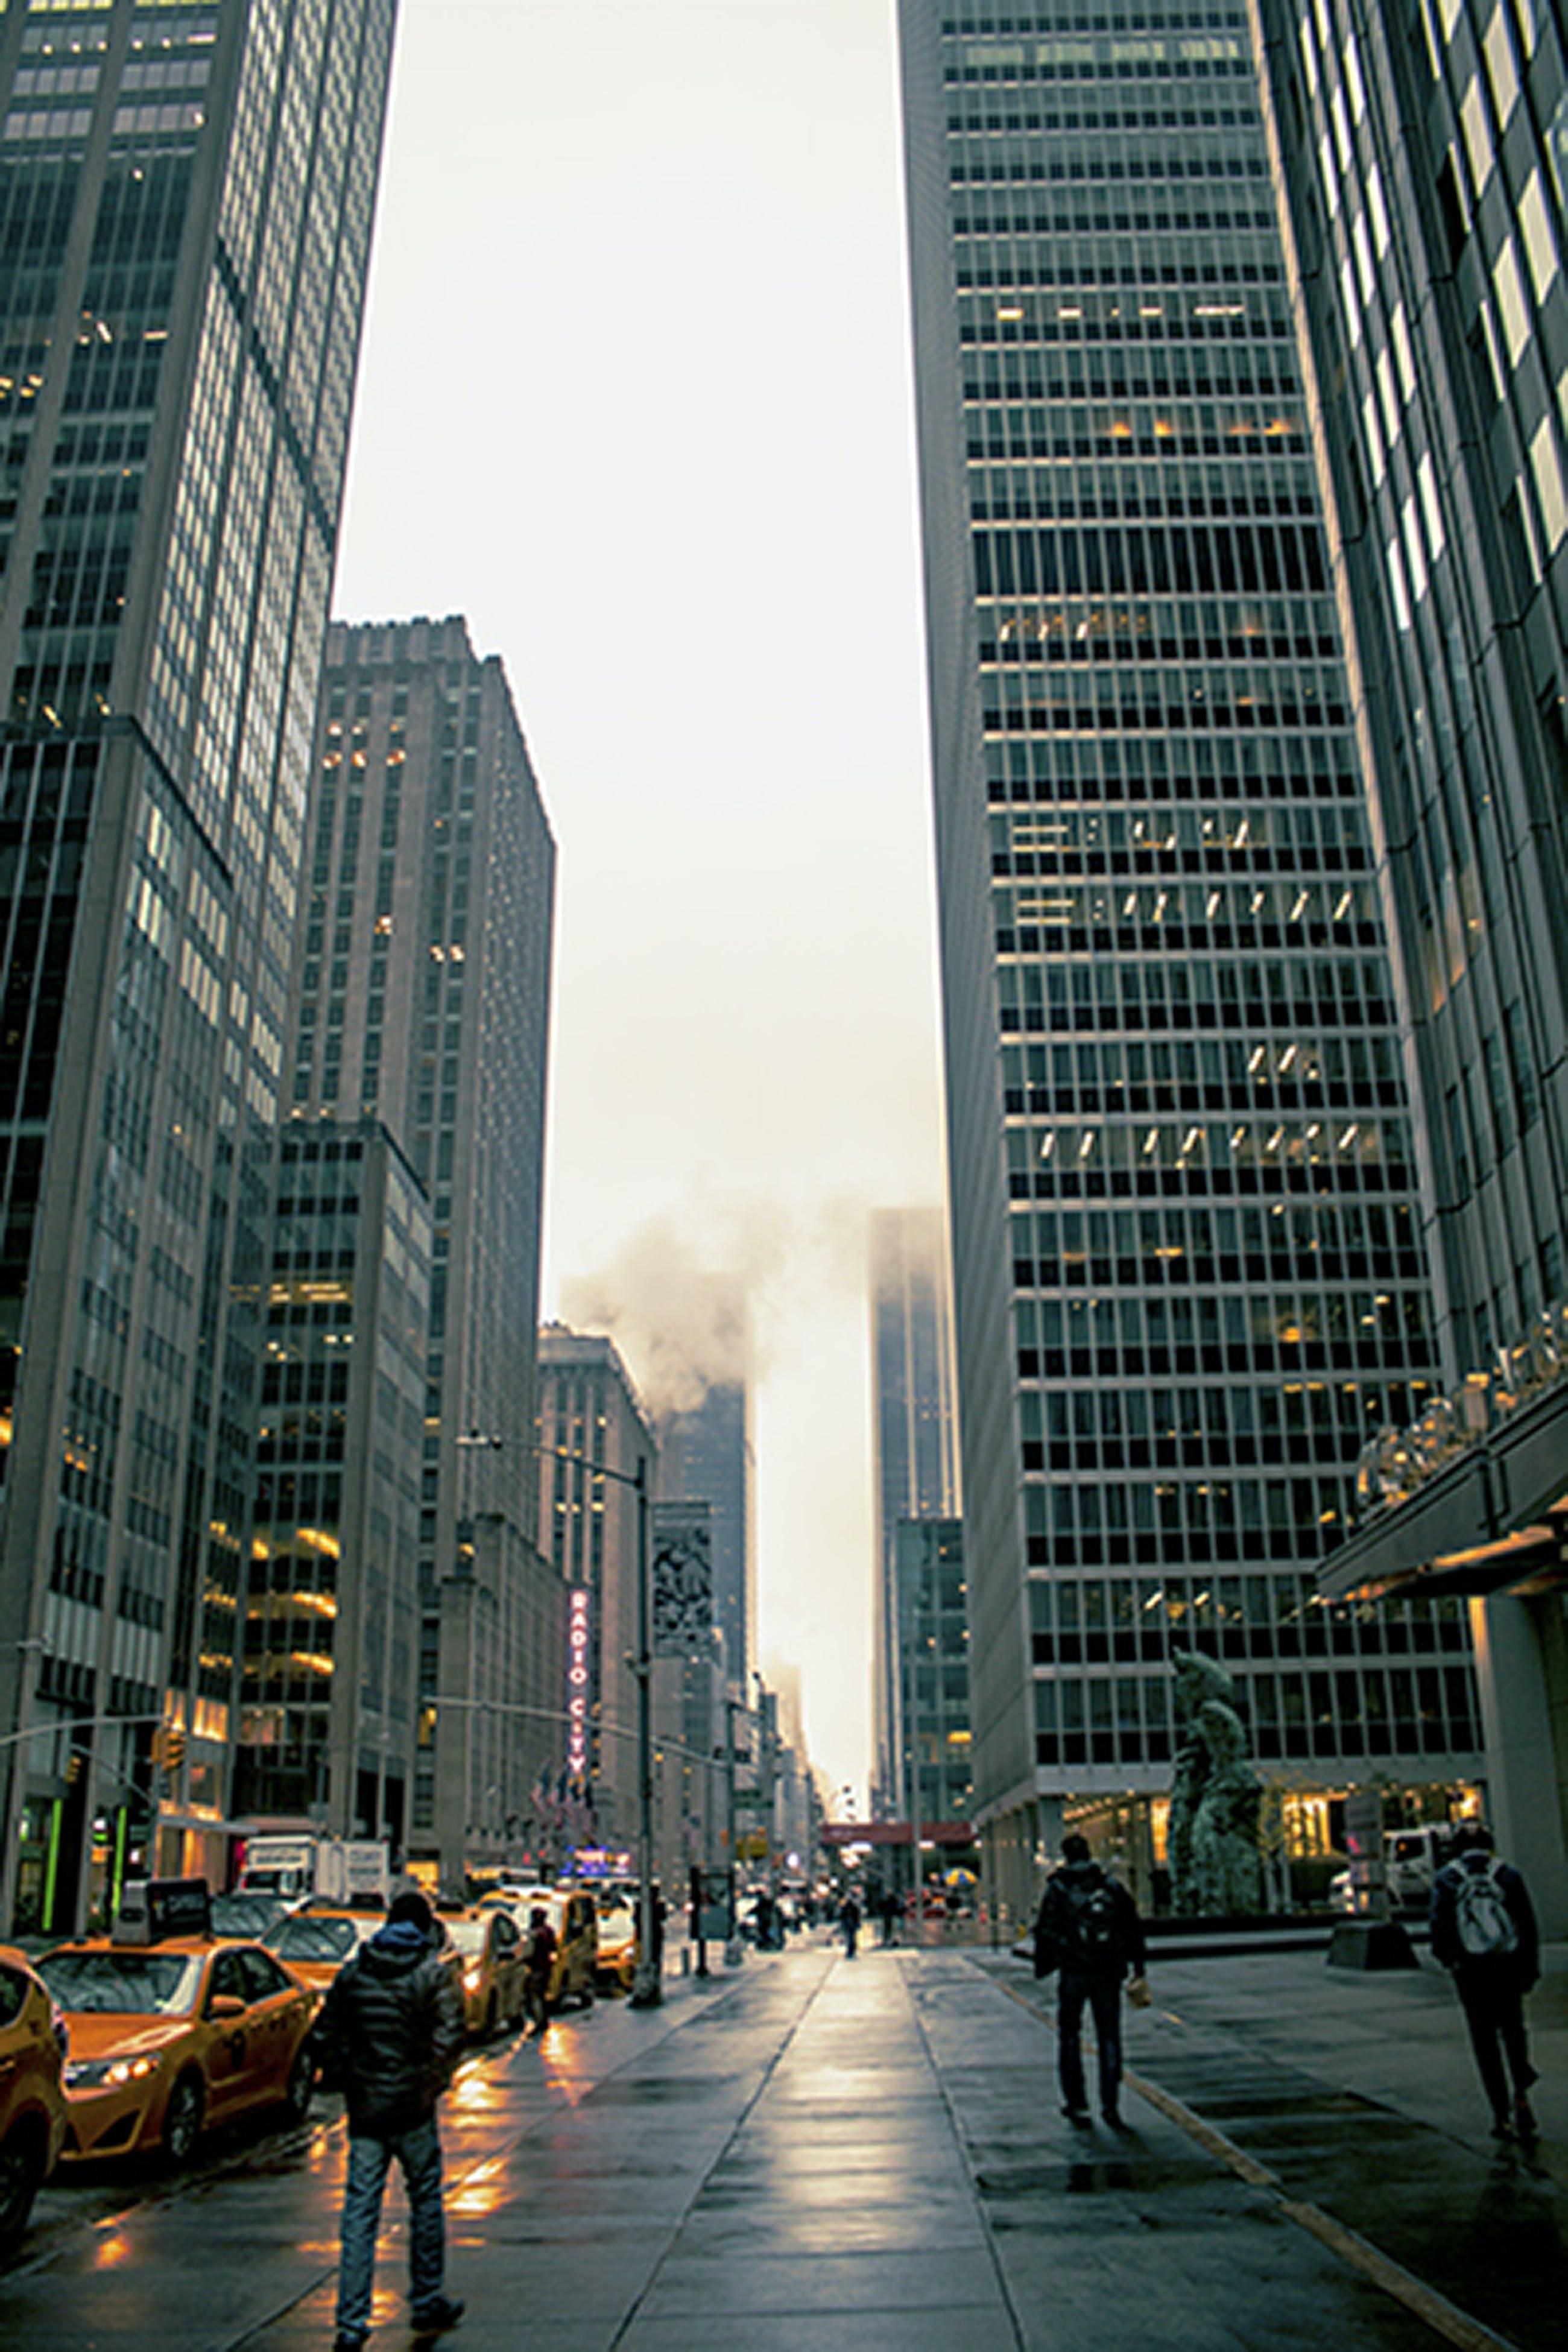 Free stock photo of #bigcity, #city, #citylife, #Cityscape